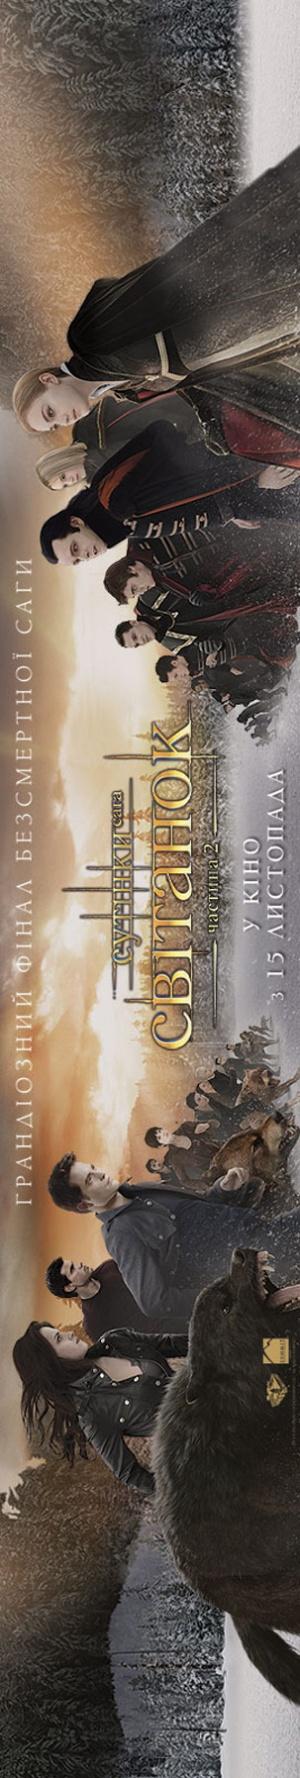 The Twilight Saga: Breaking Dawn - Part 2 303x1796